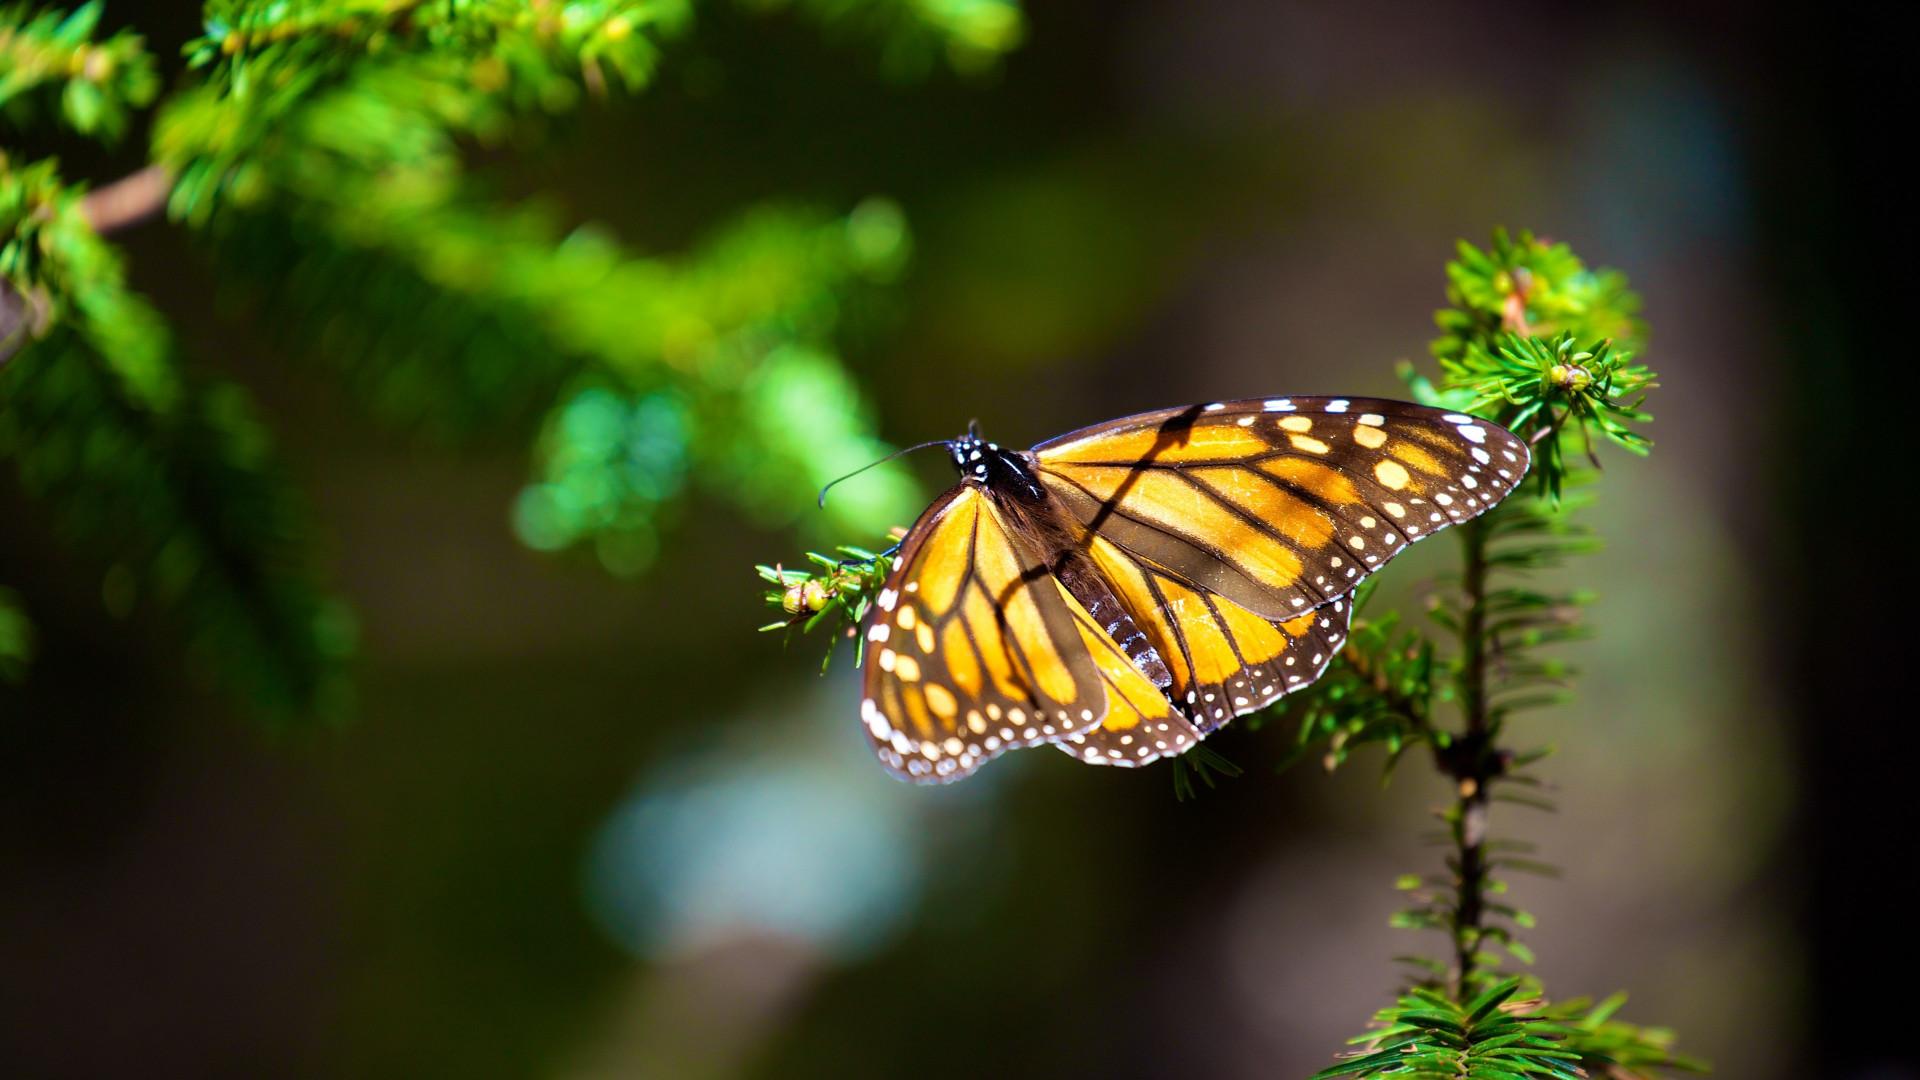 Download wallpaper: Monarch butterfly 1920x1080